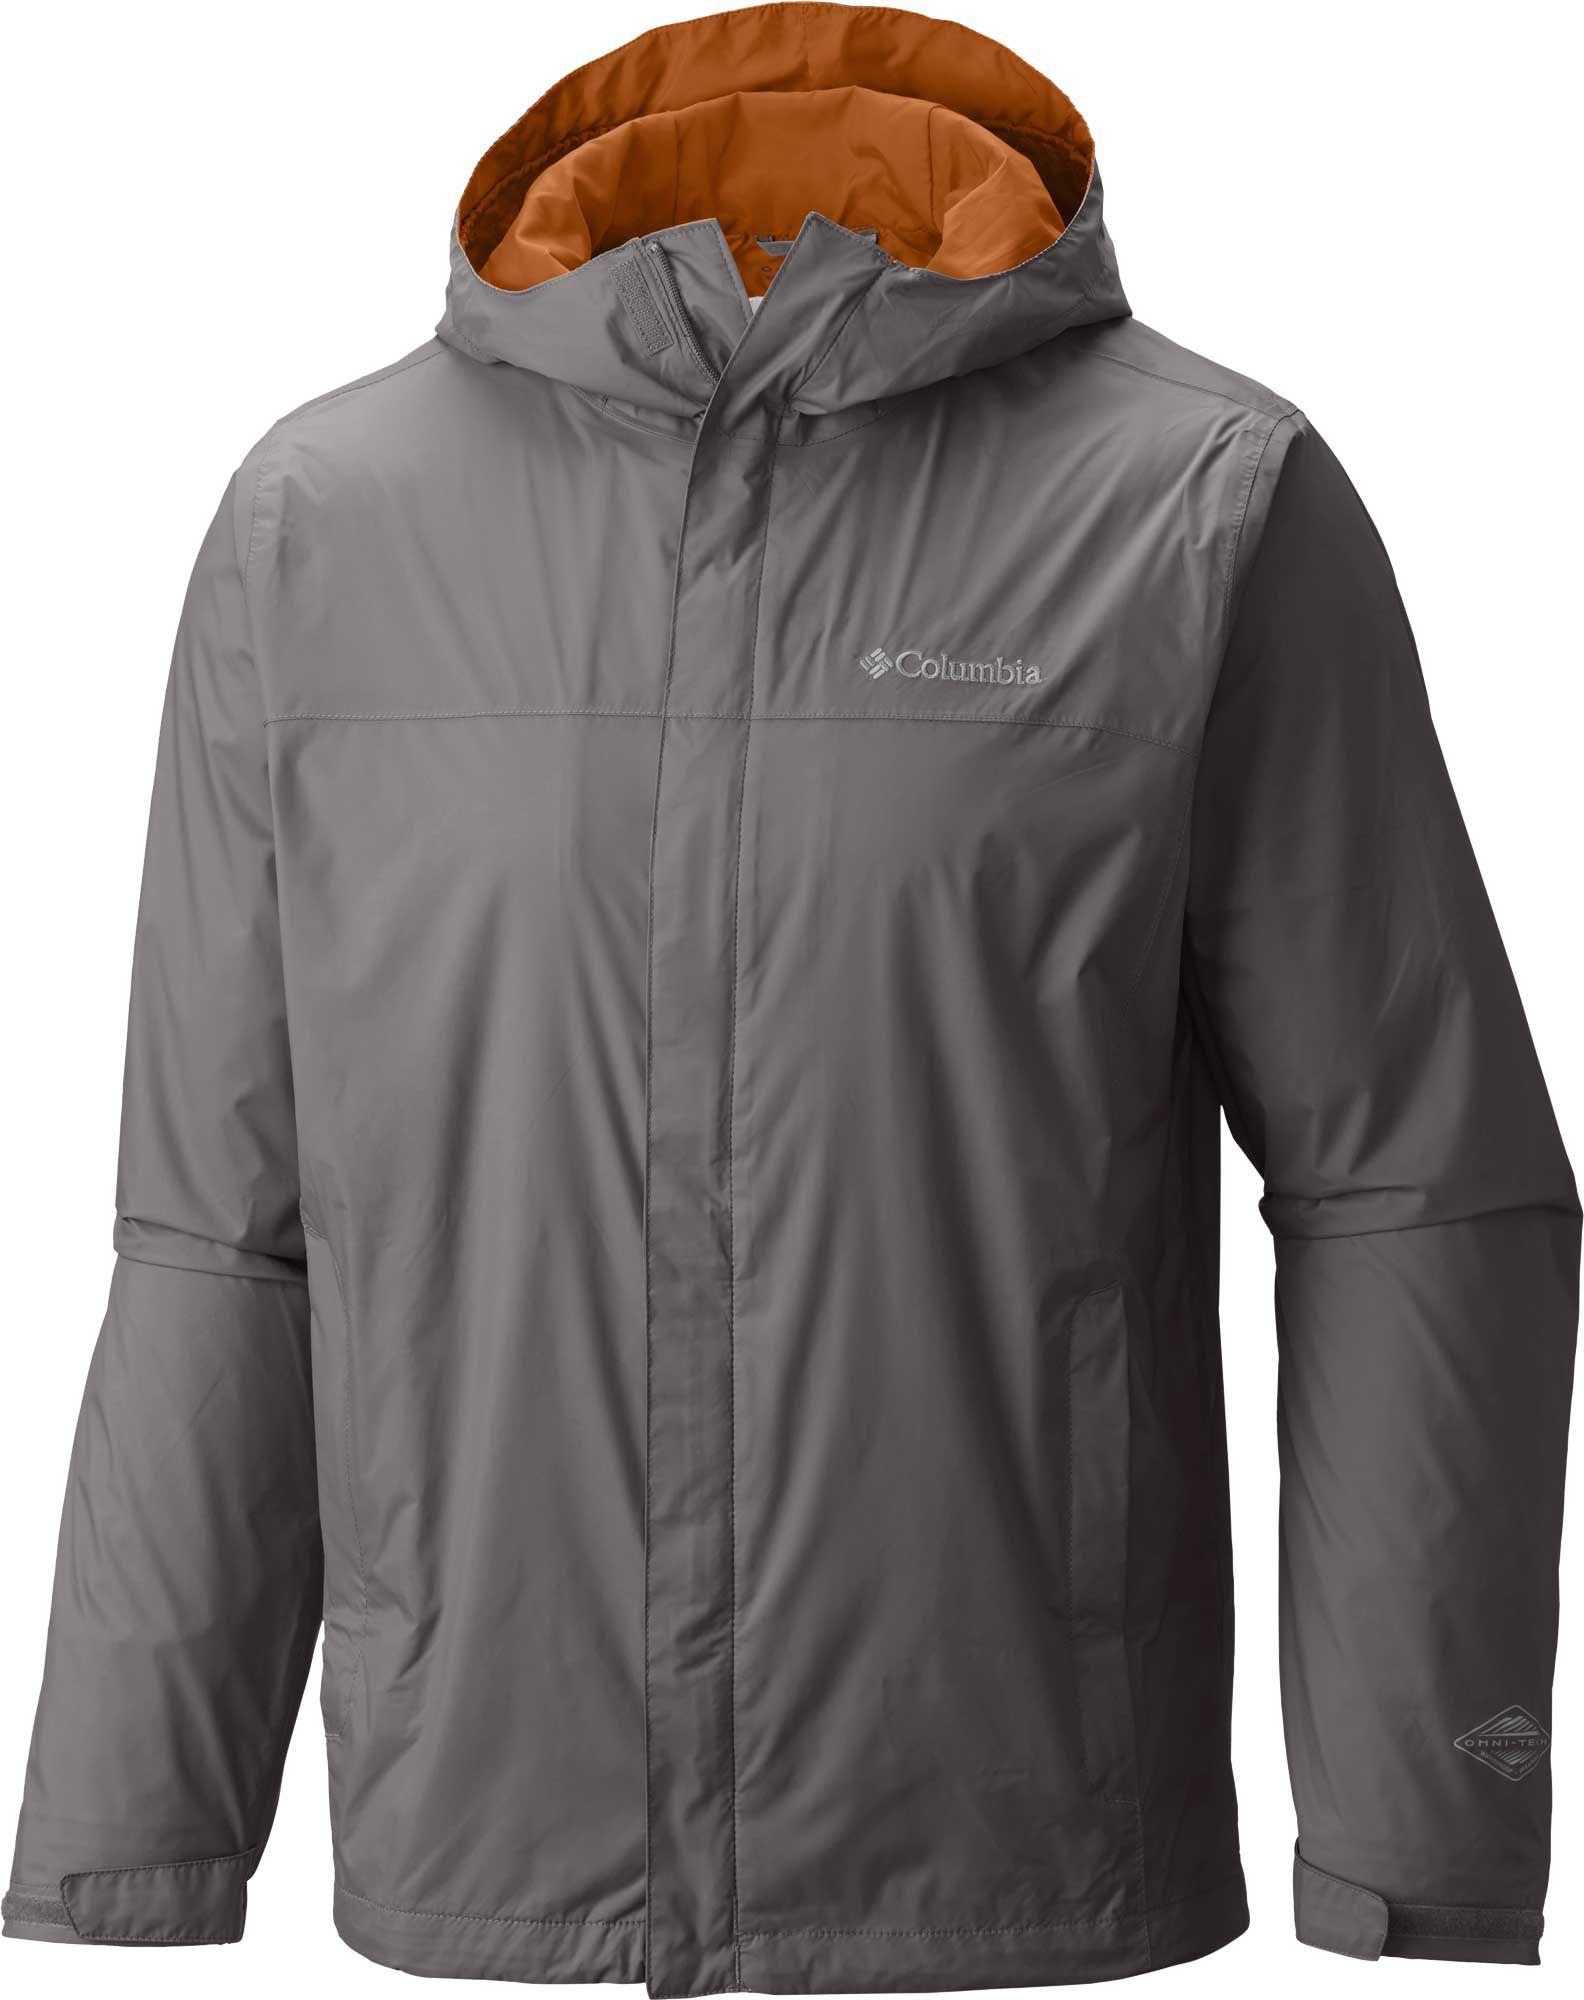 waterproof jacket product image · columbia menu0027s watertight ii rain jacket qdhgldp